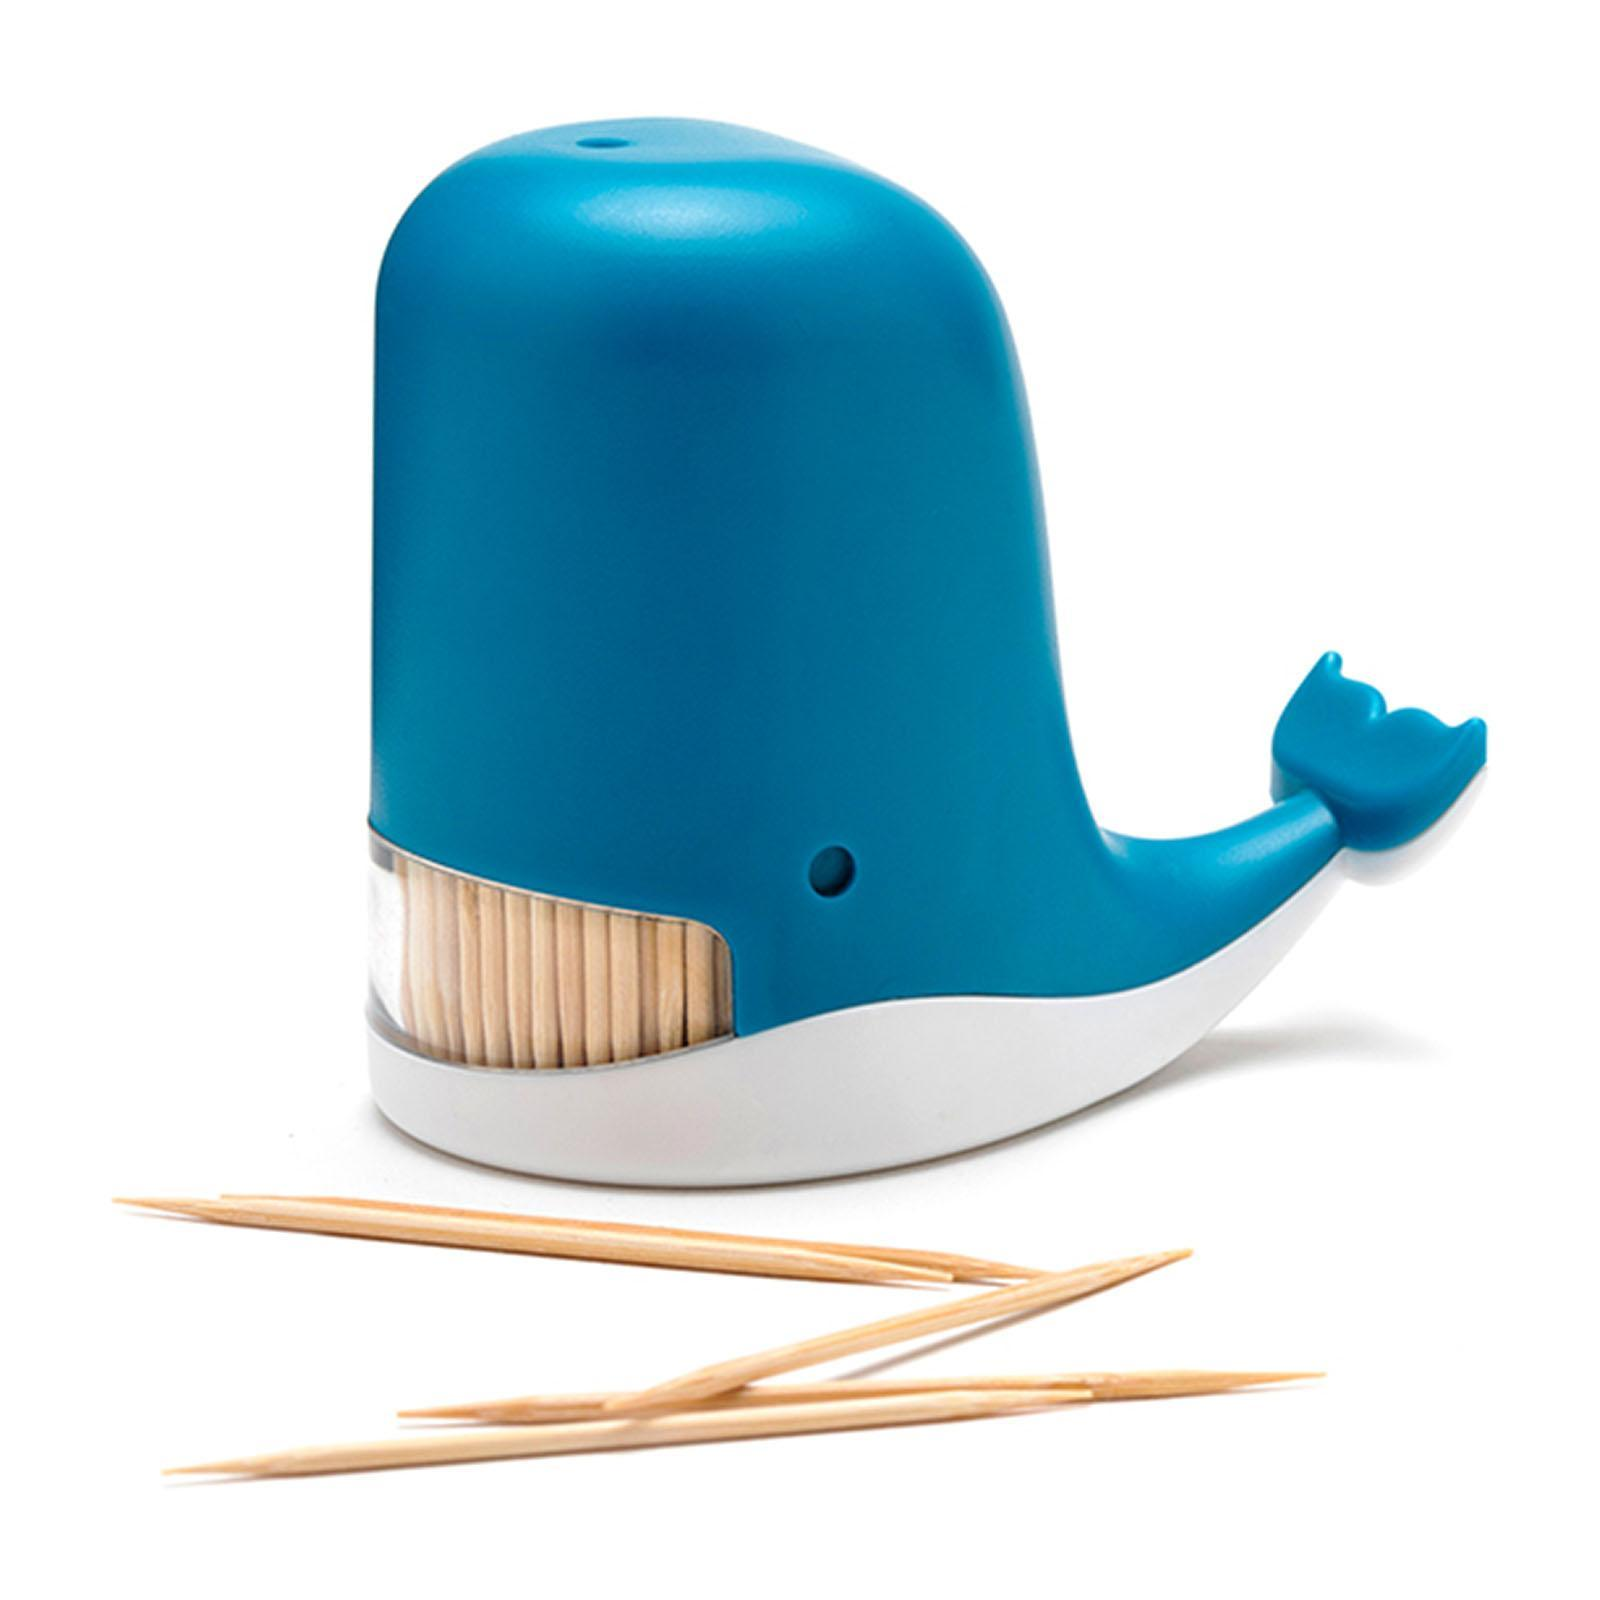 Peleg Design Jonah Toothpick Dispenser